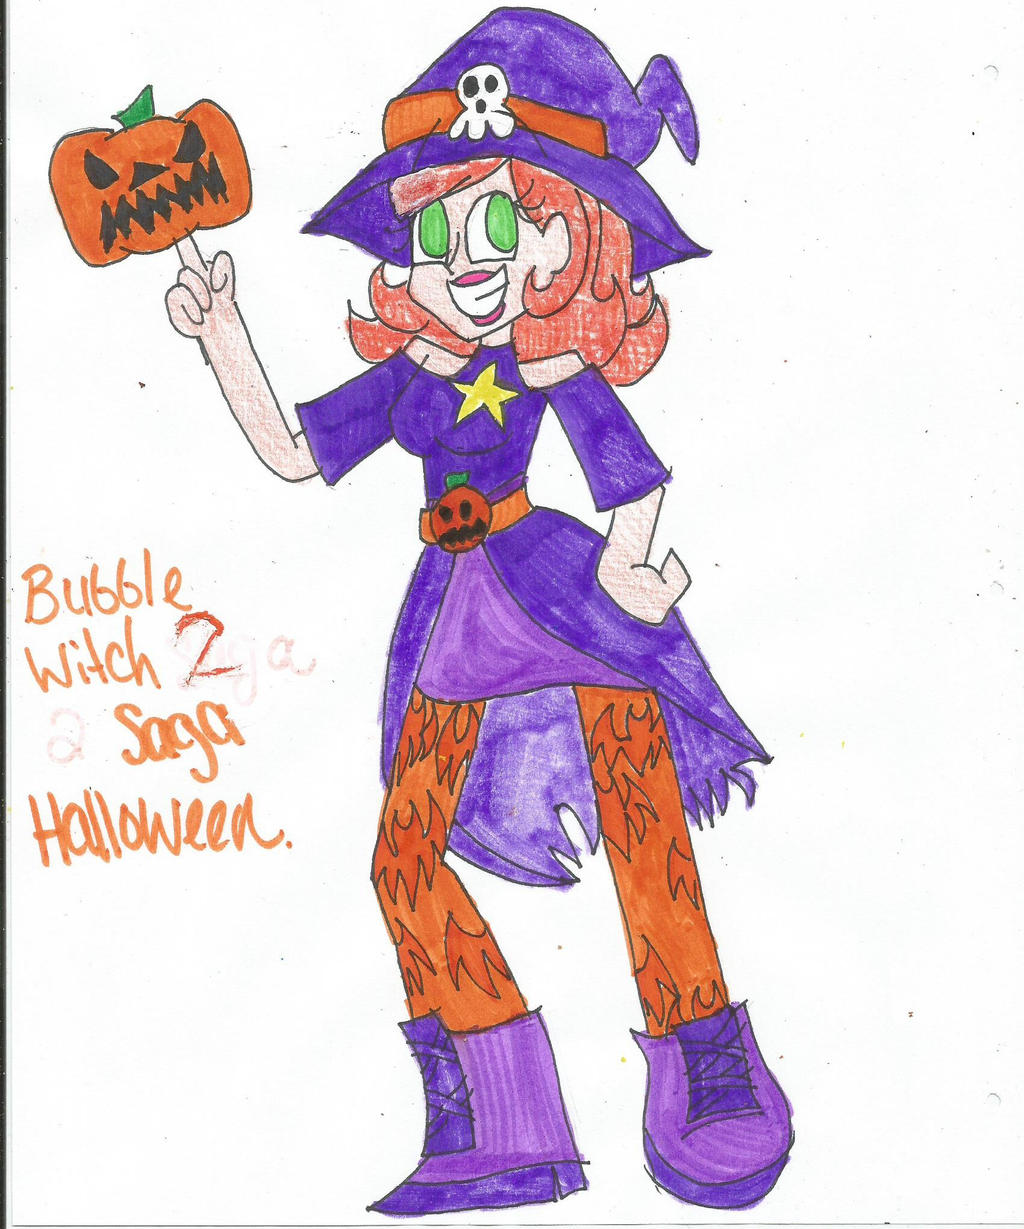 Bubble Witch 2 Saga: Halloween by xXFluffyPachirisuXx on DeviantArt